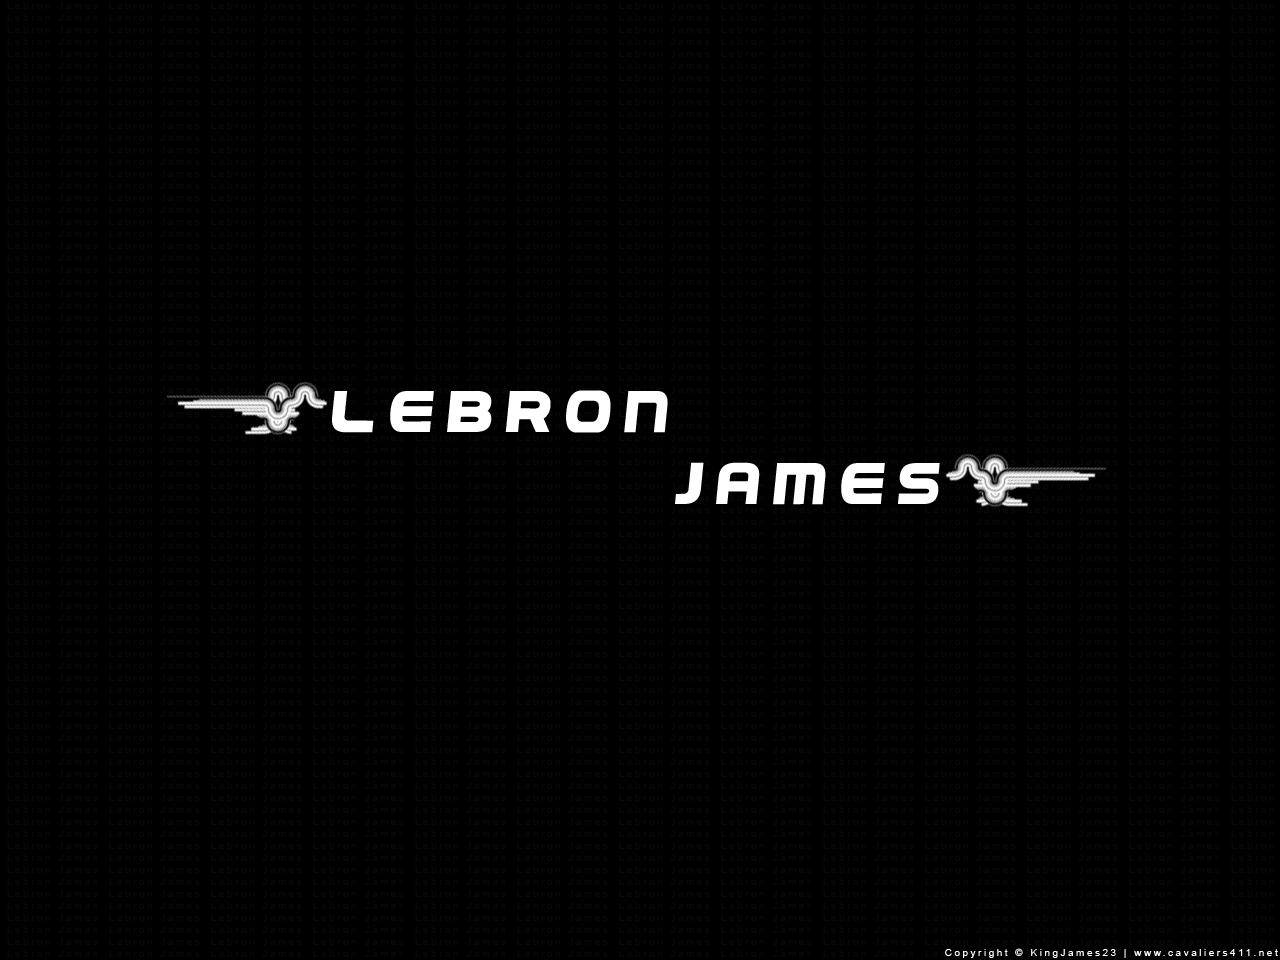 http://fc00.deviantart.net/fs45/f/2009/137/a/4/Lebron_James_Wallpaper_by_reboundmaster01.png